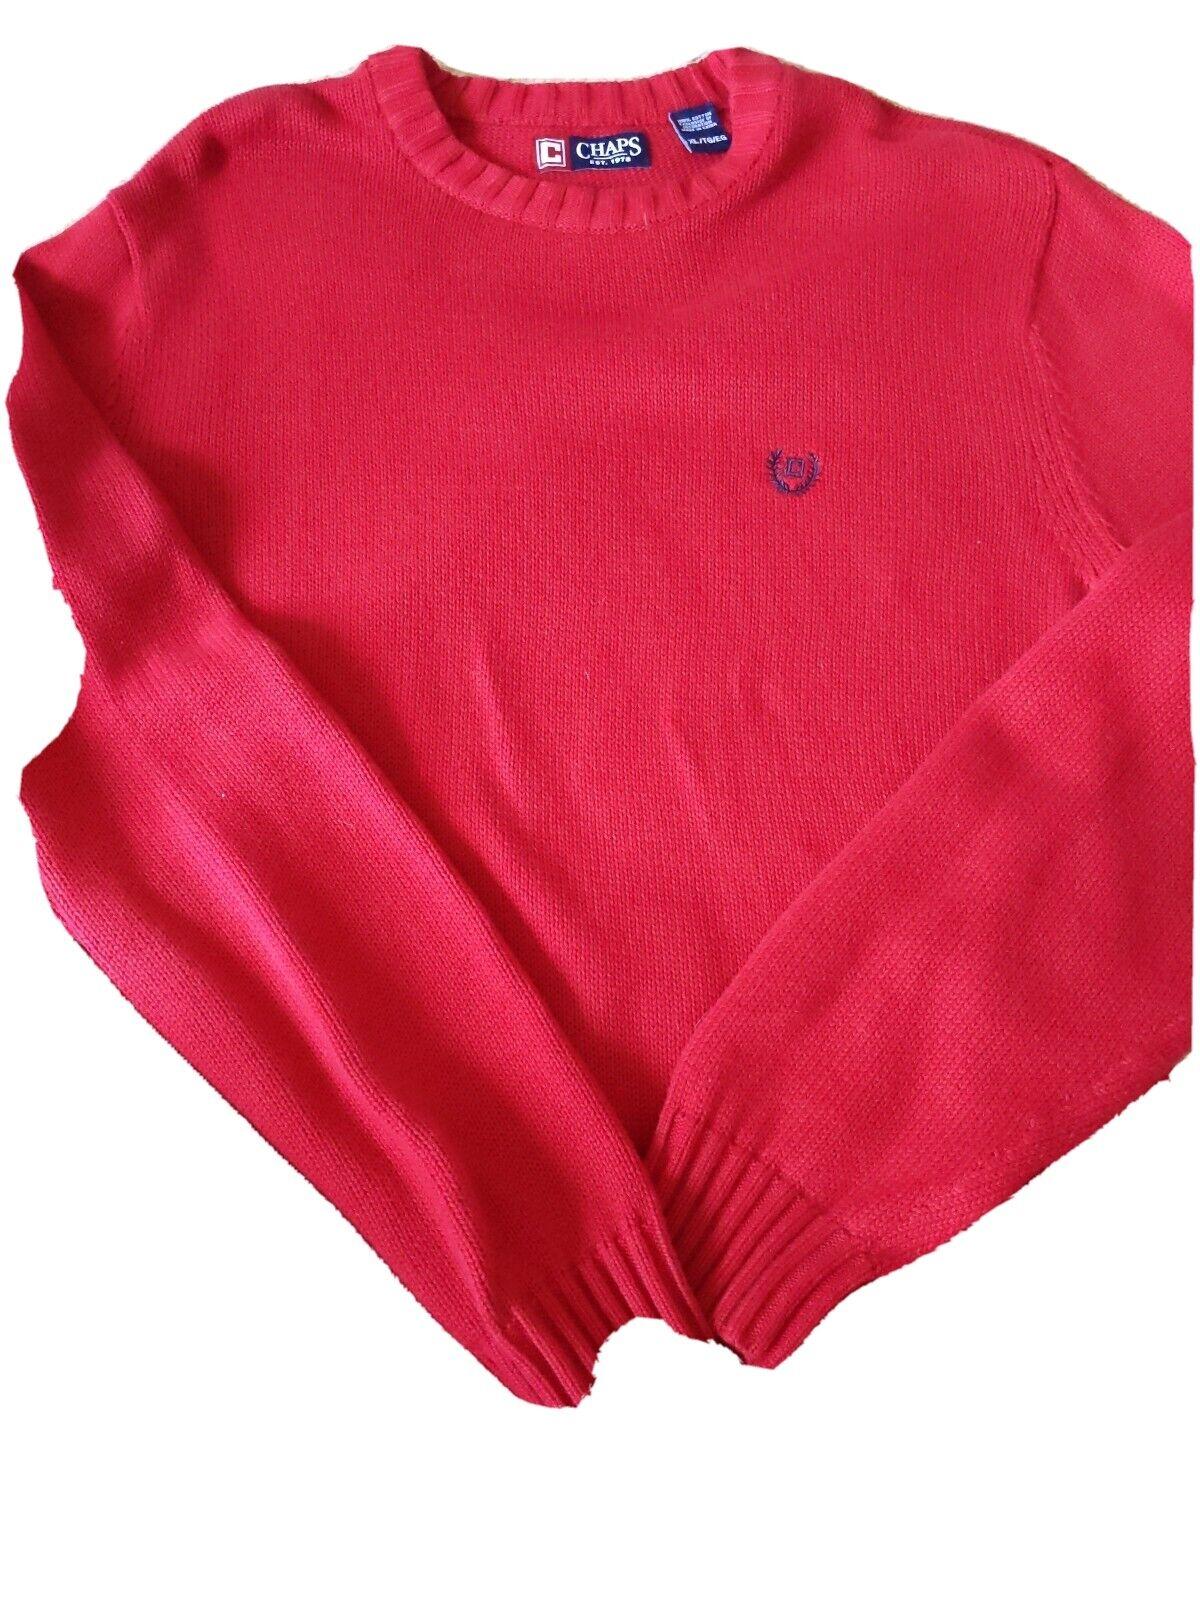 Steel Heat Gray Men/'s Chaps Classic-Fit Solid Crewneck Sweater 63600